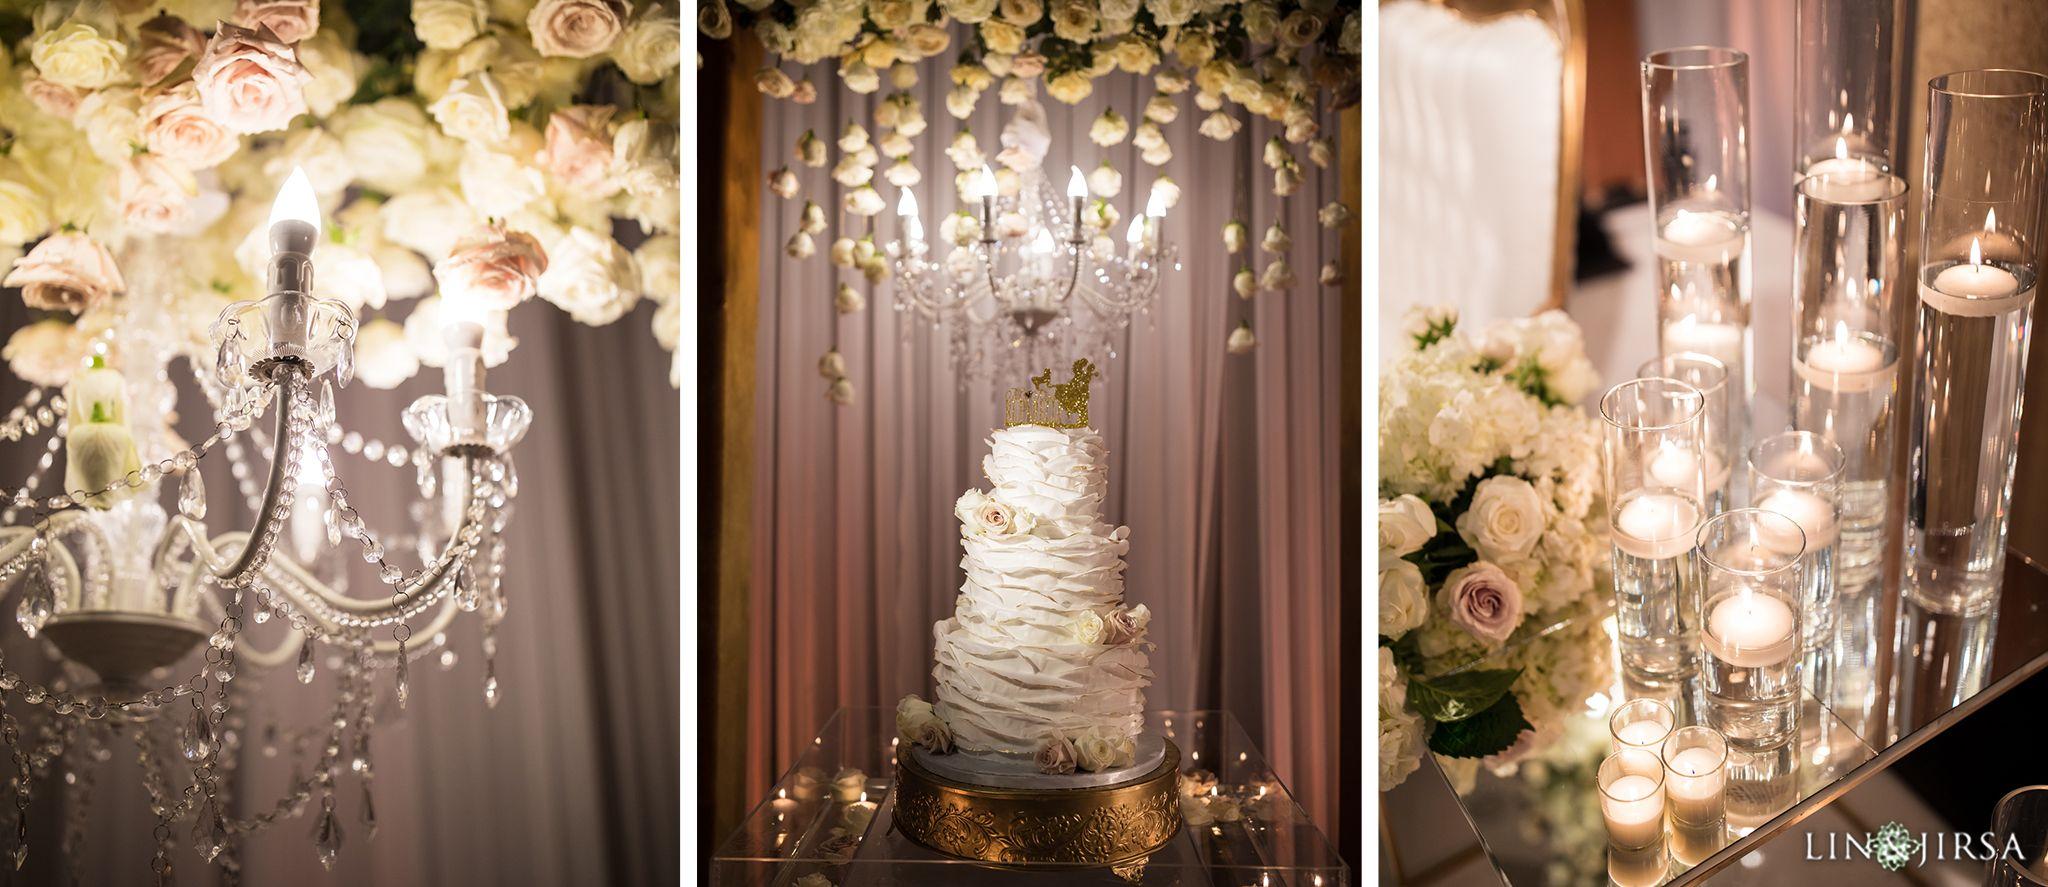 indian wedding photography design%0A   hotelirvineindianweddingphotography